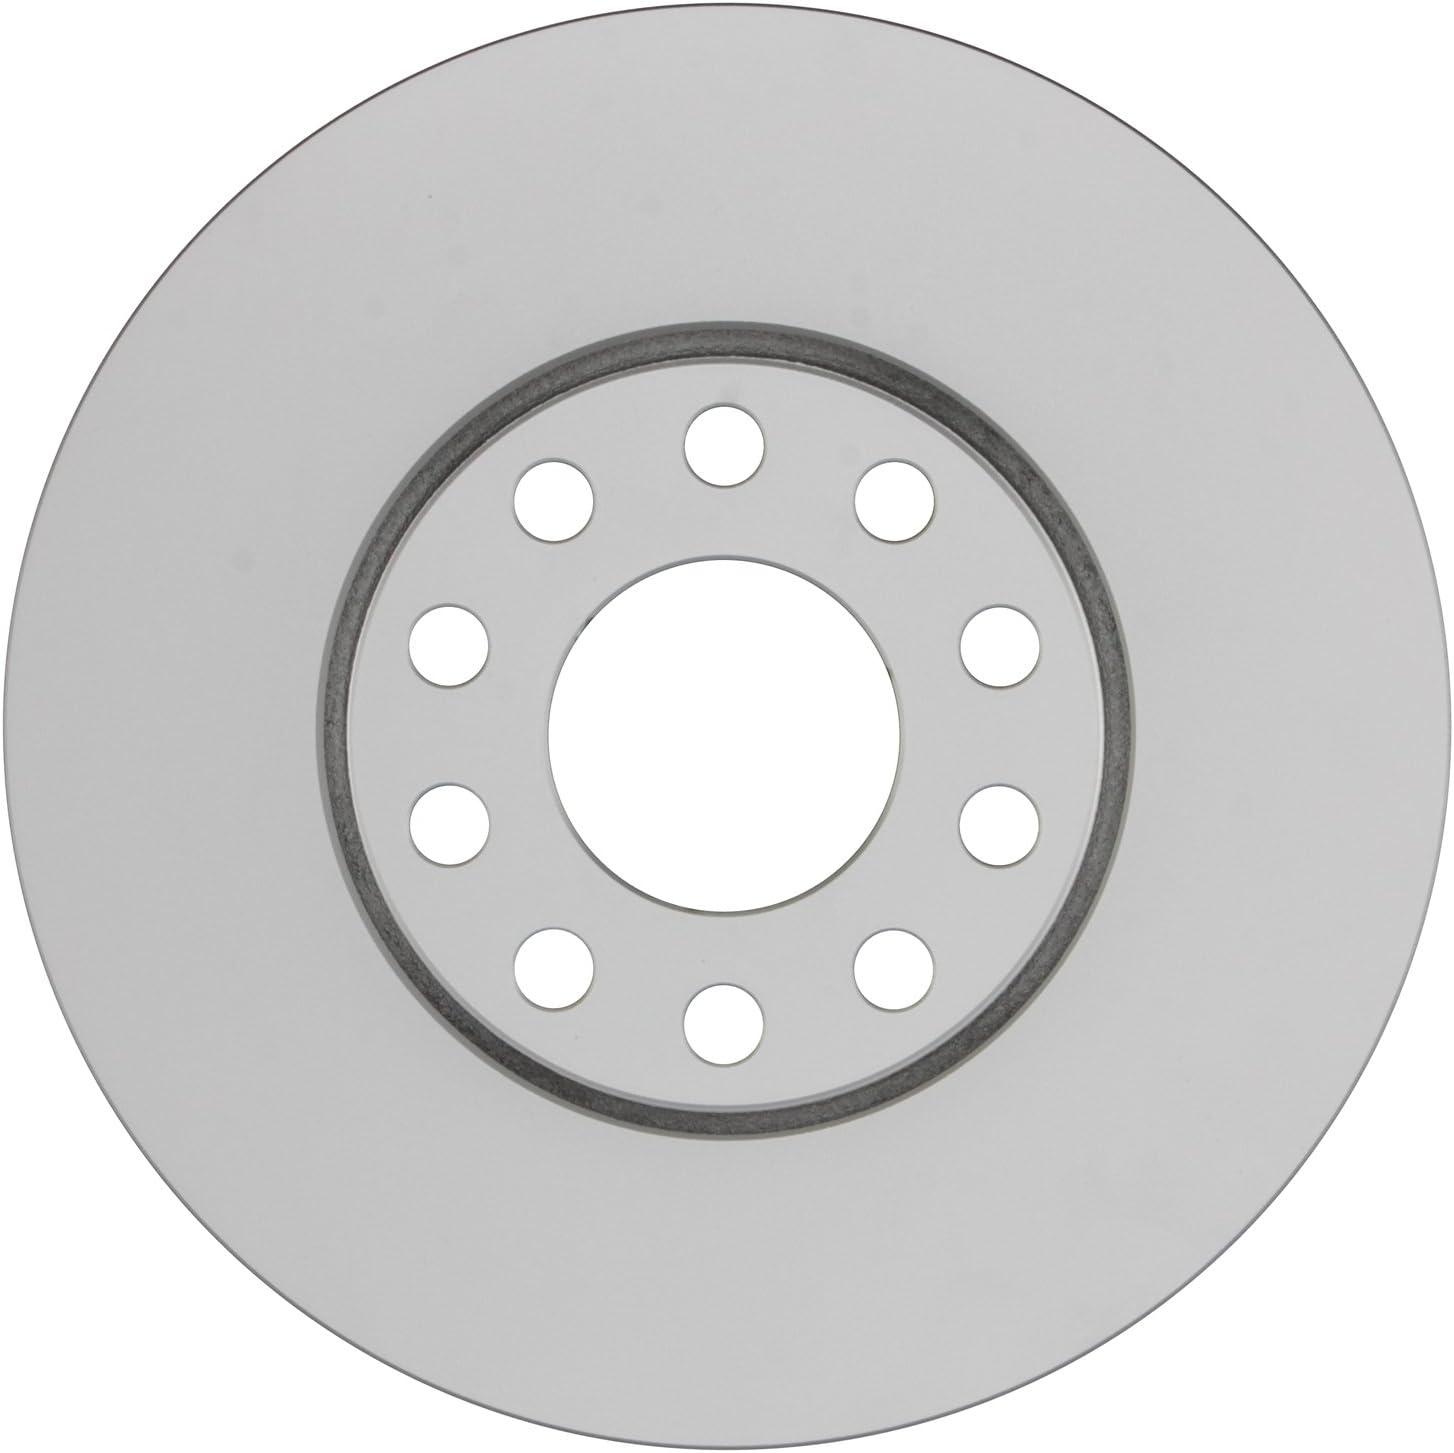 Bosch 53011391 QuietCast Premium Disc Outlet SALE Rotor shop 2004-2005 Brake For